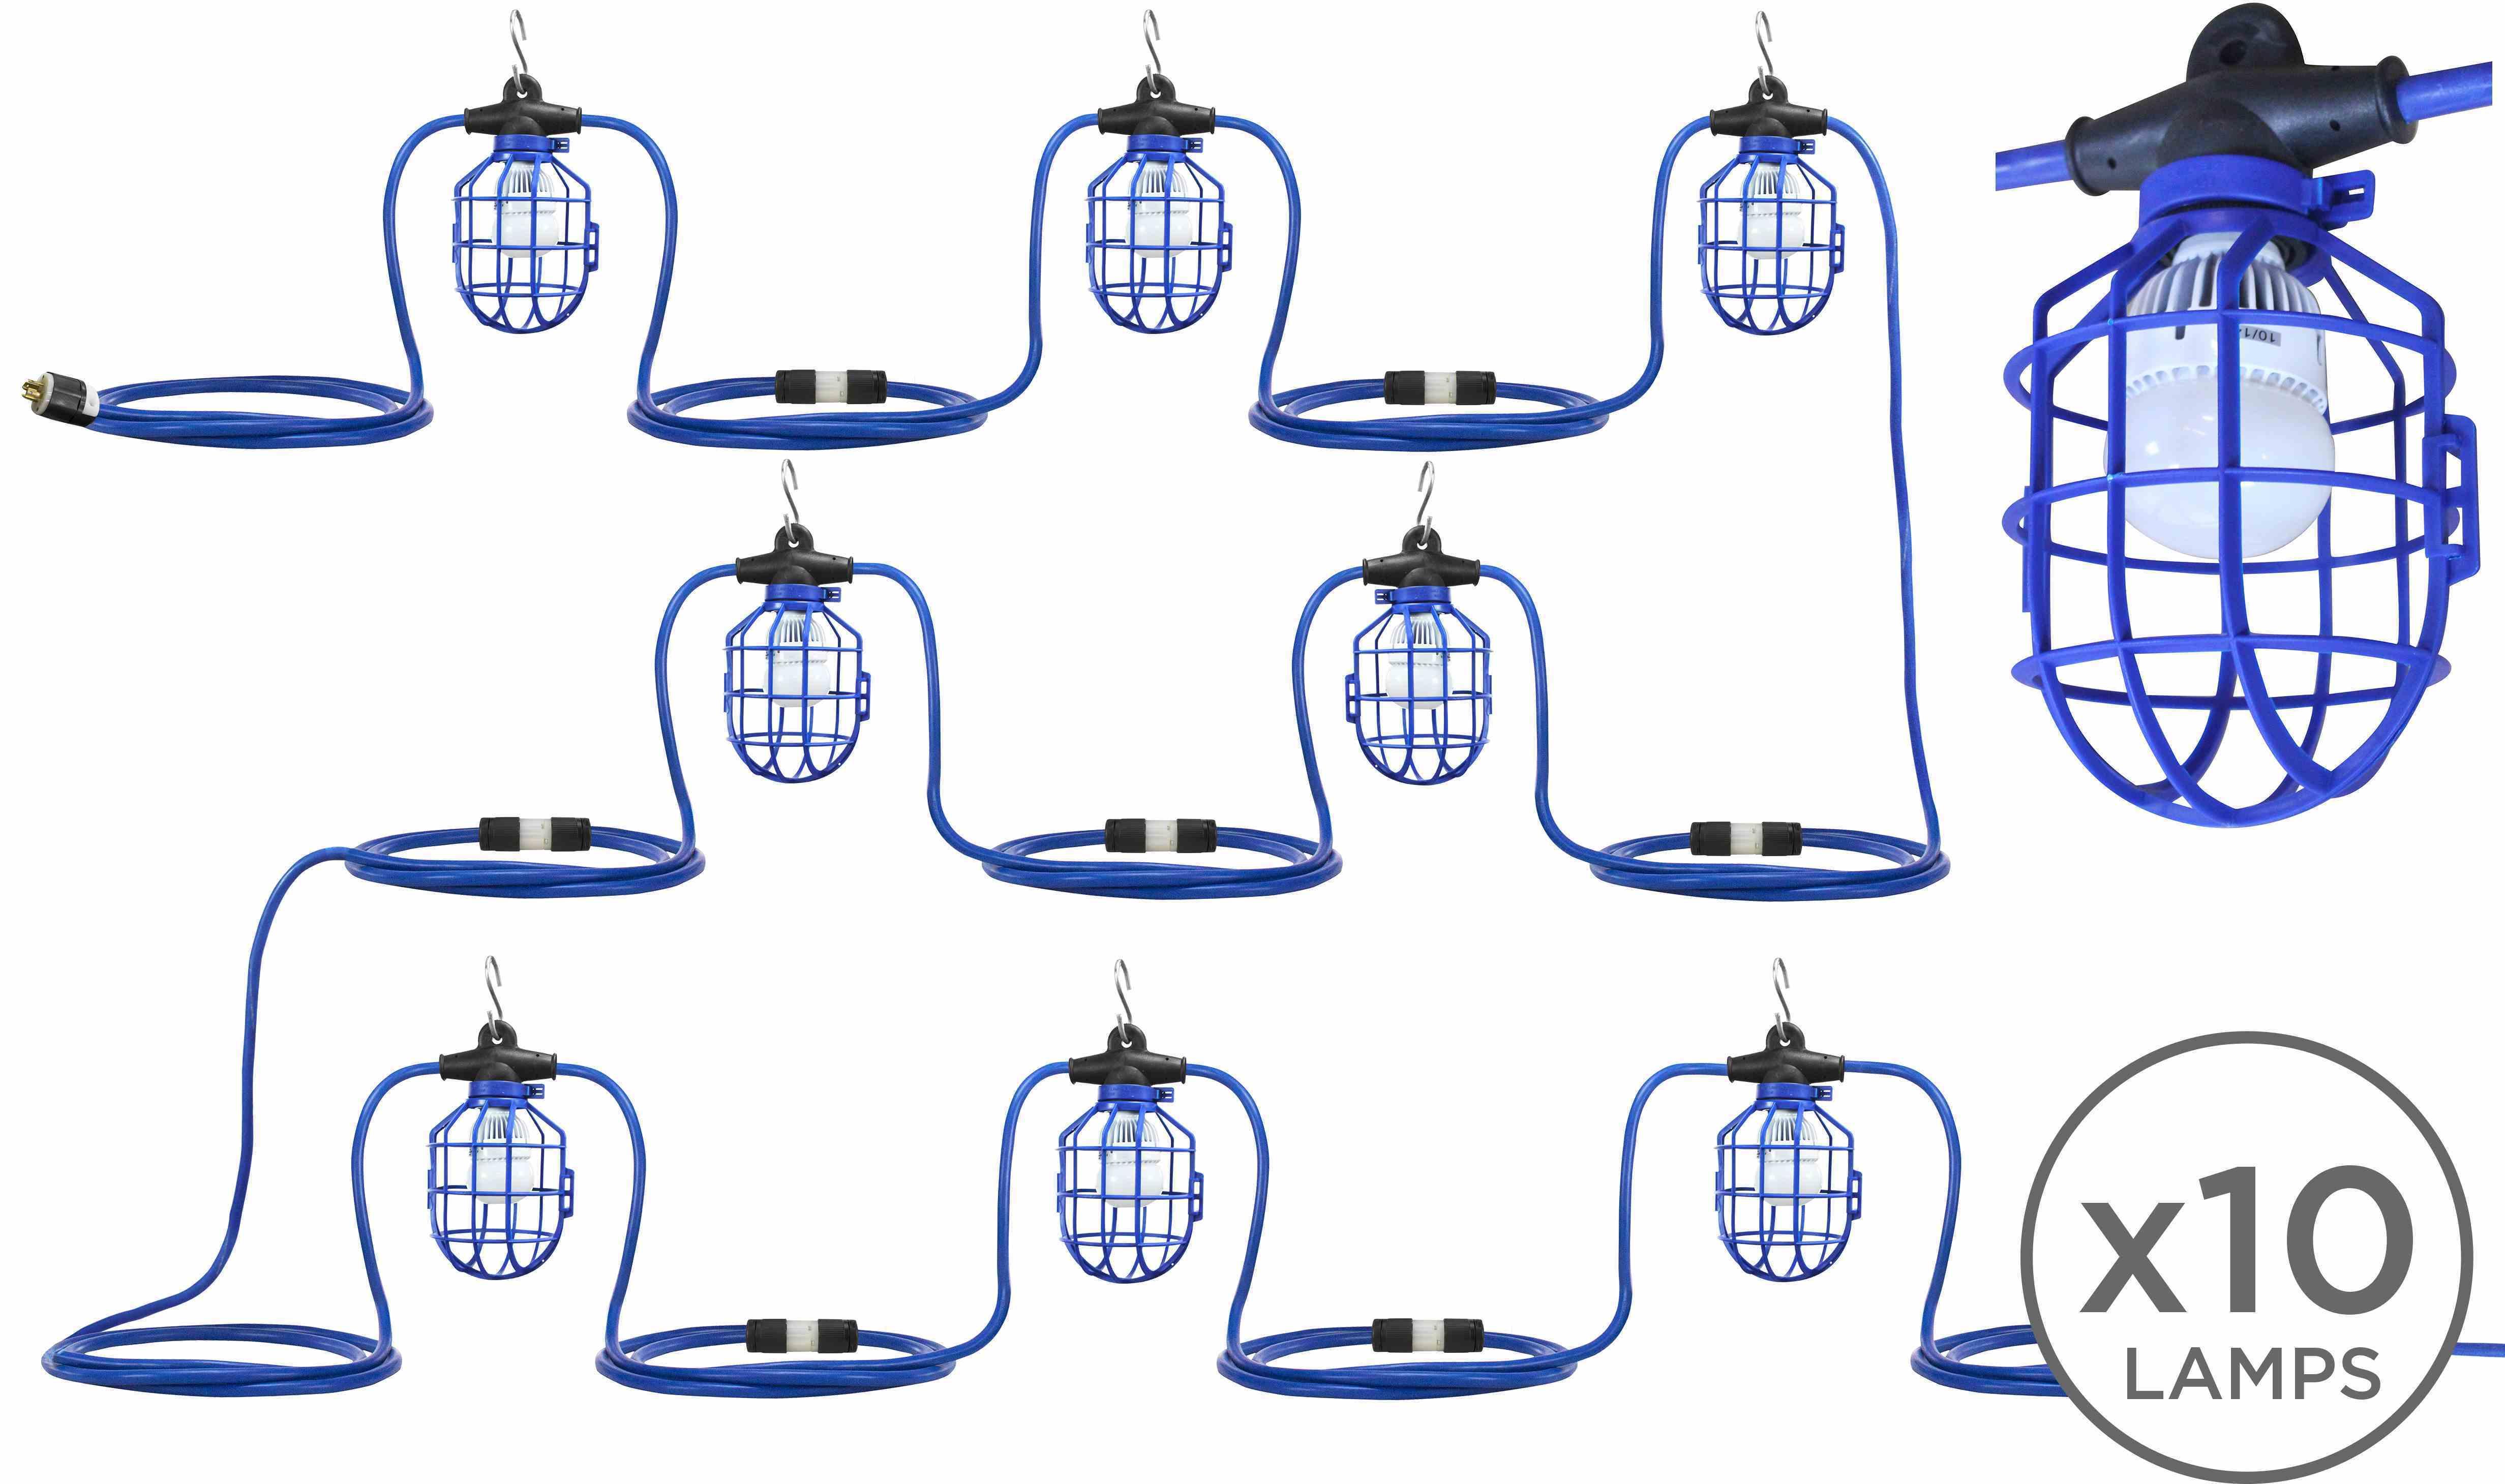 Temporary String Lights Led : 100 Temporary Construction String Light - Ten LED Work Lamps - 120-277V Stepped Down to 12-24V ...